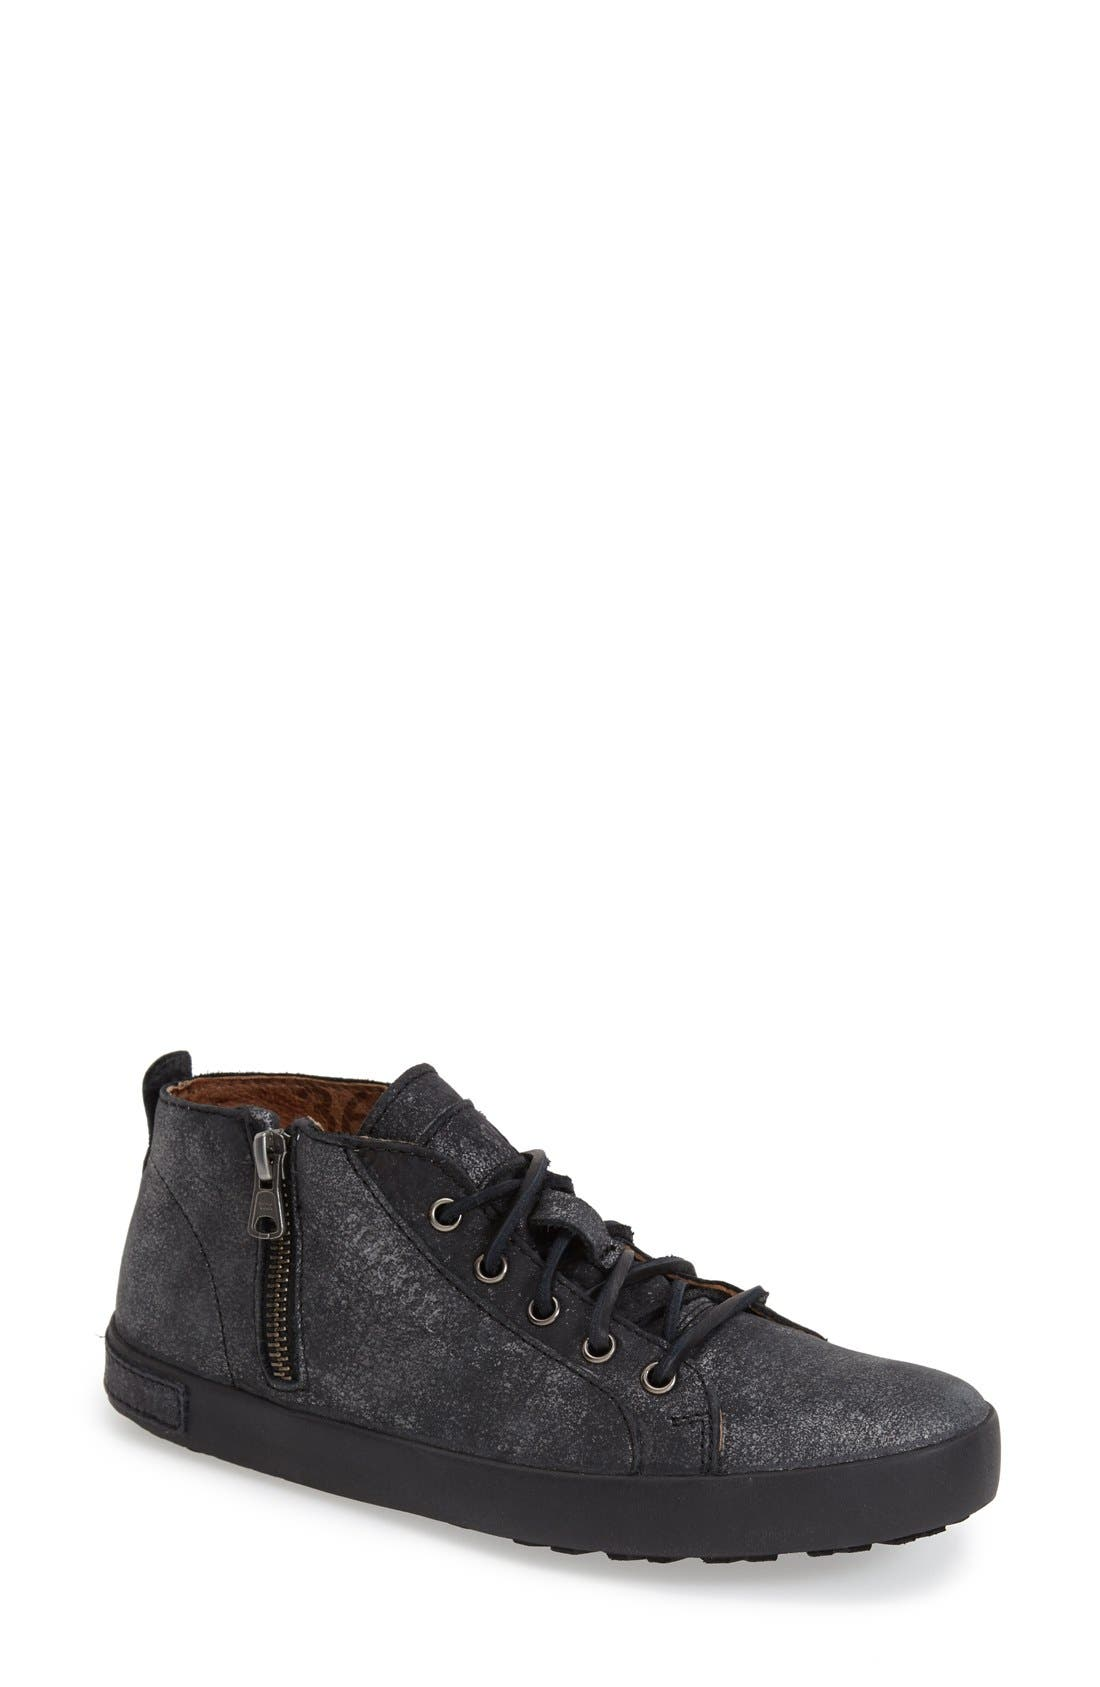 BLACKSTONE,                             'JL17' Sneaker,                             Main thumbnail 1, color,                             BLACK METALLIC